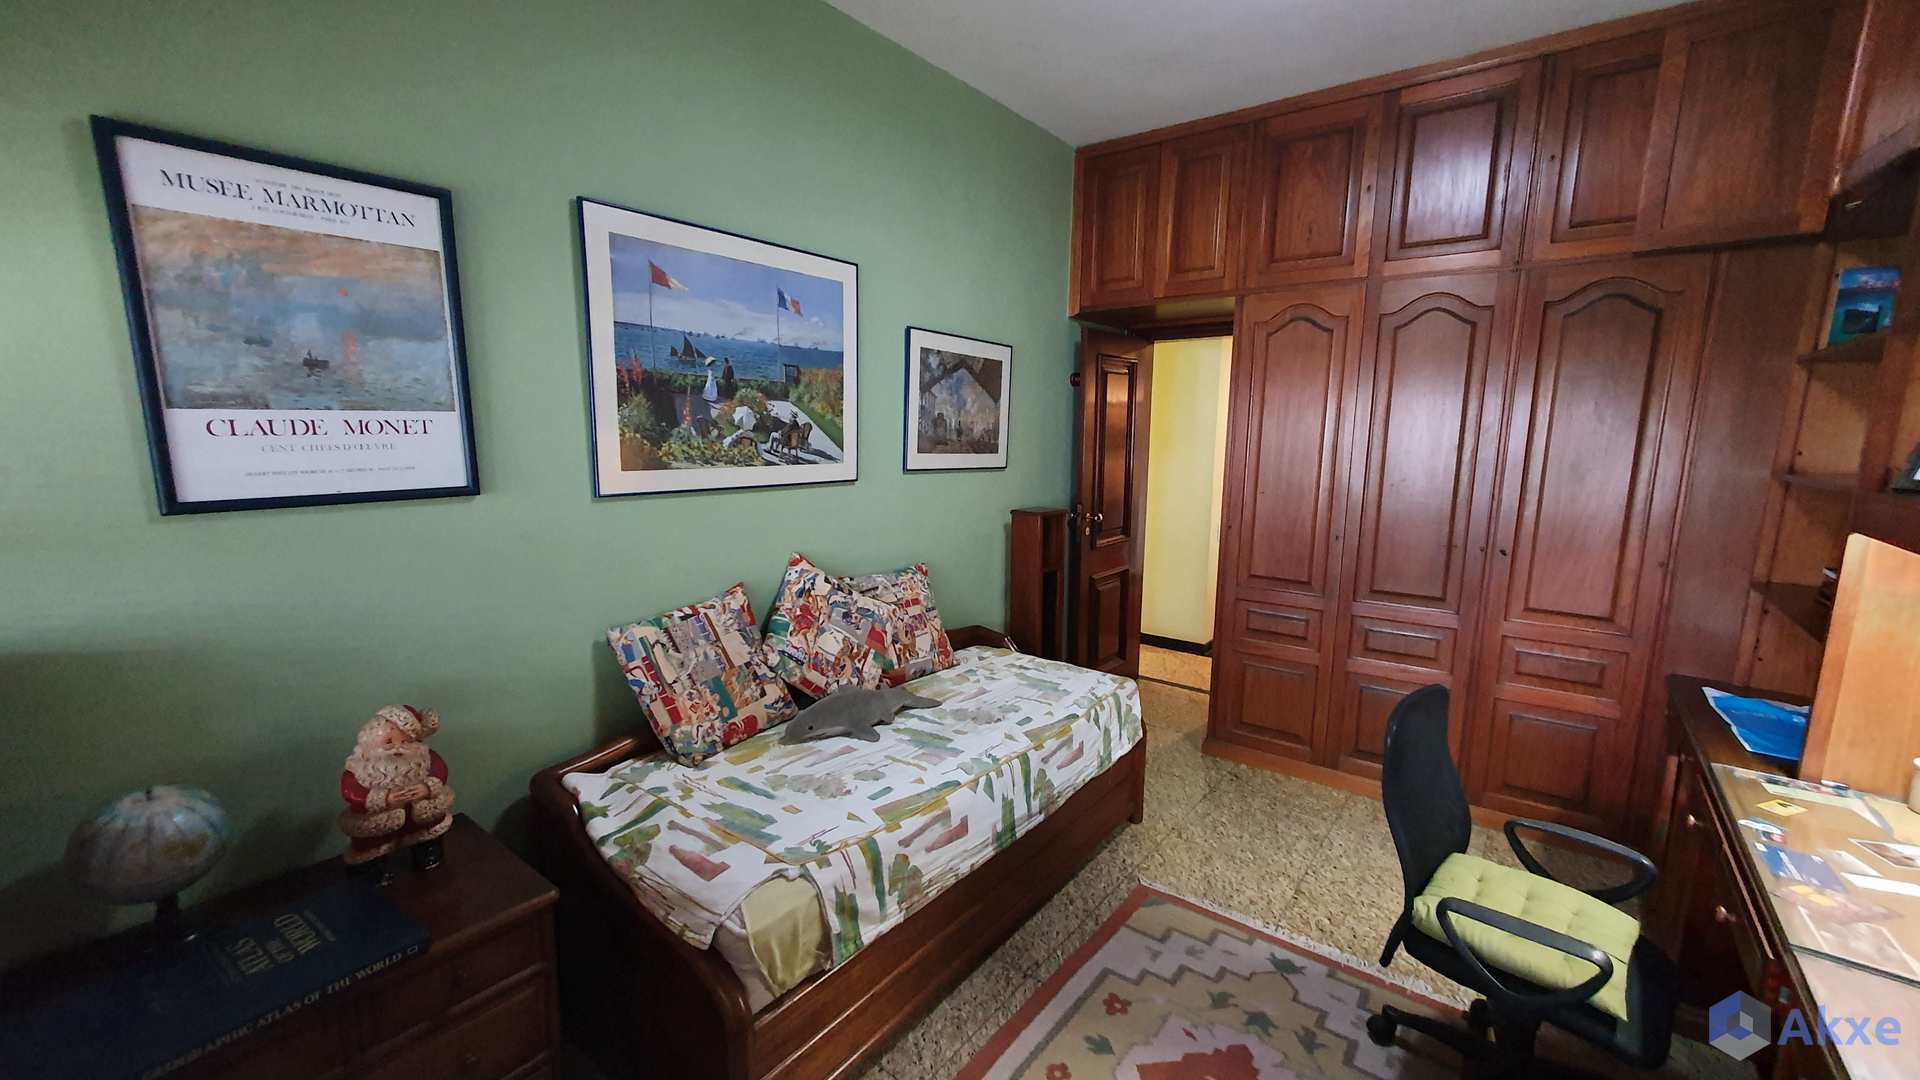 4 quartos na Barra da Tijuca Cond. Atlântico Sul - R$ 2.7 mi